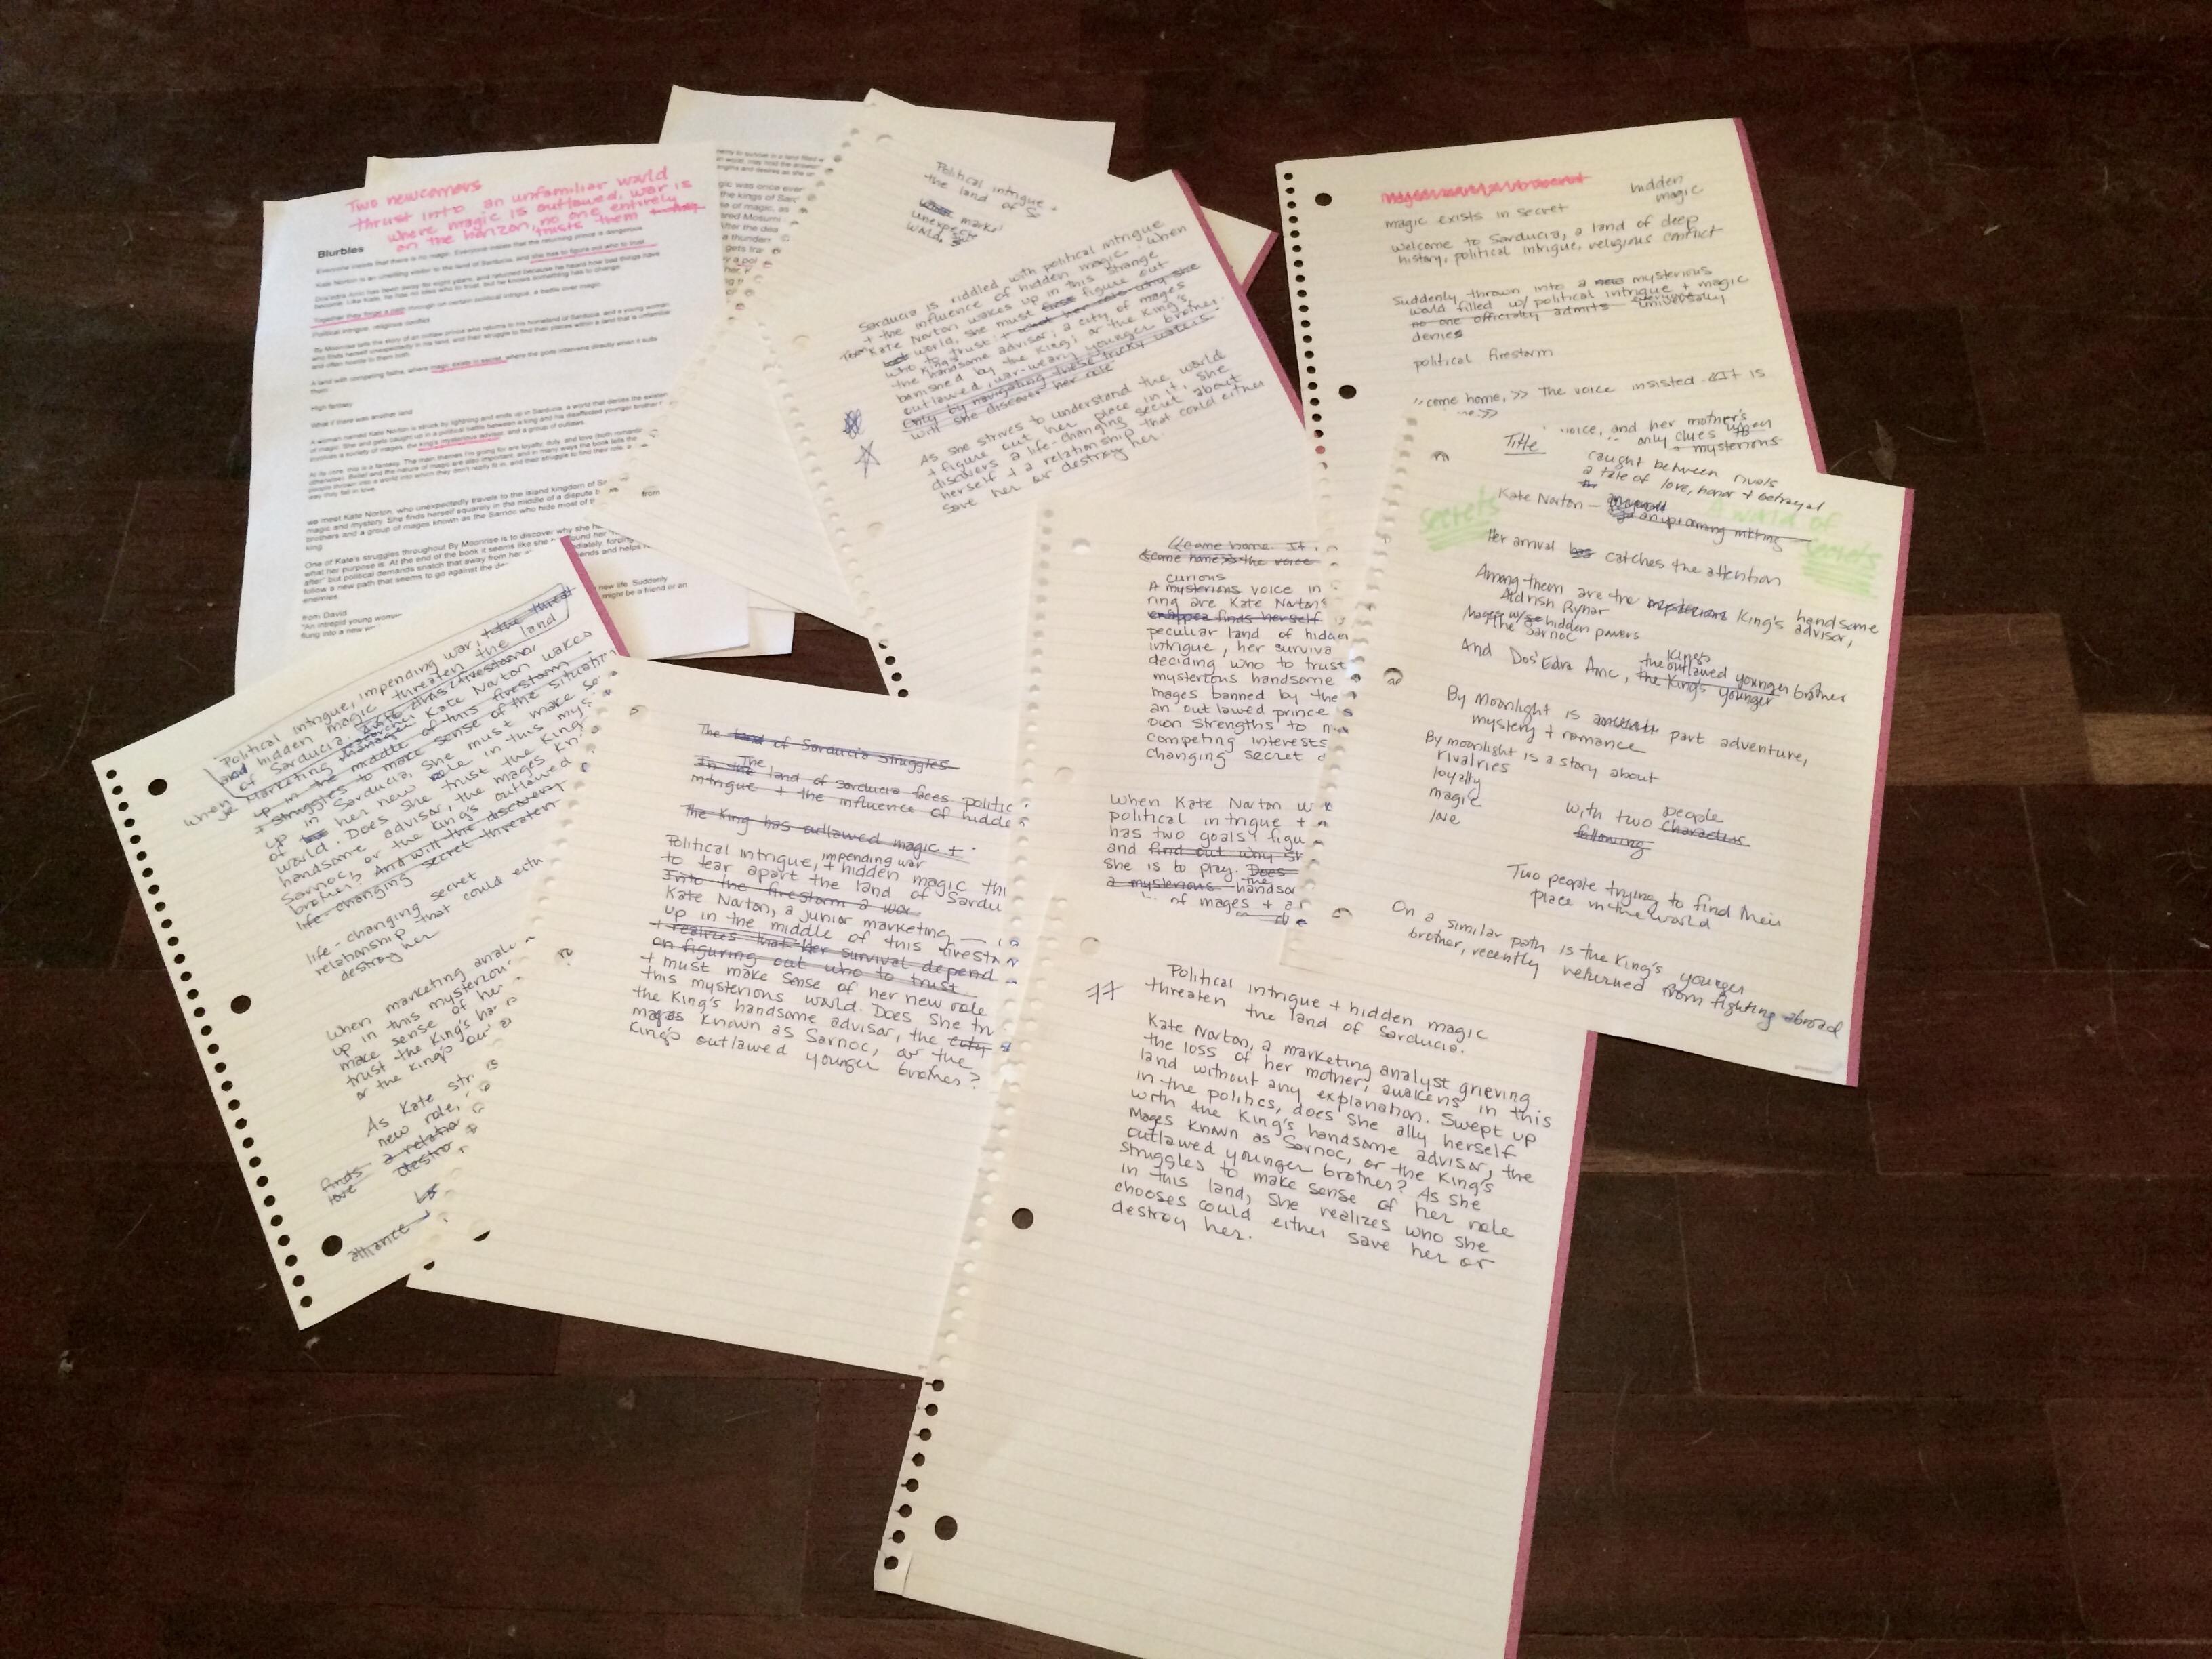 handwritten drafts